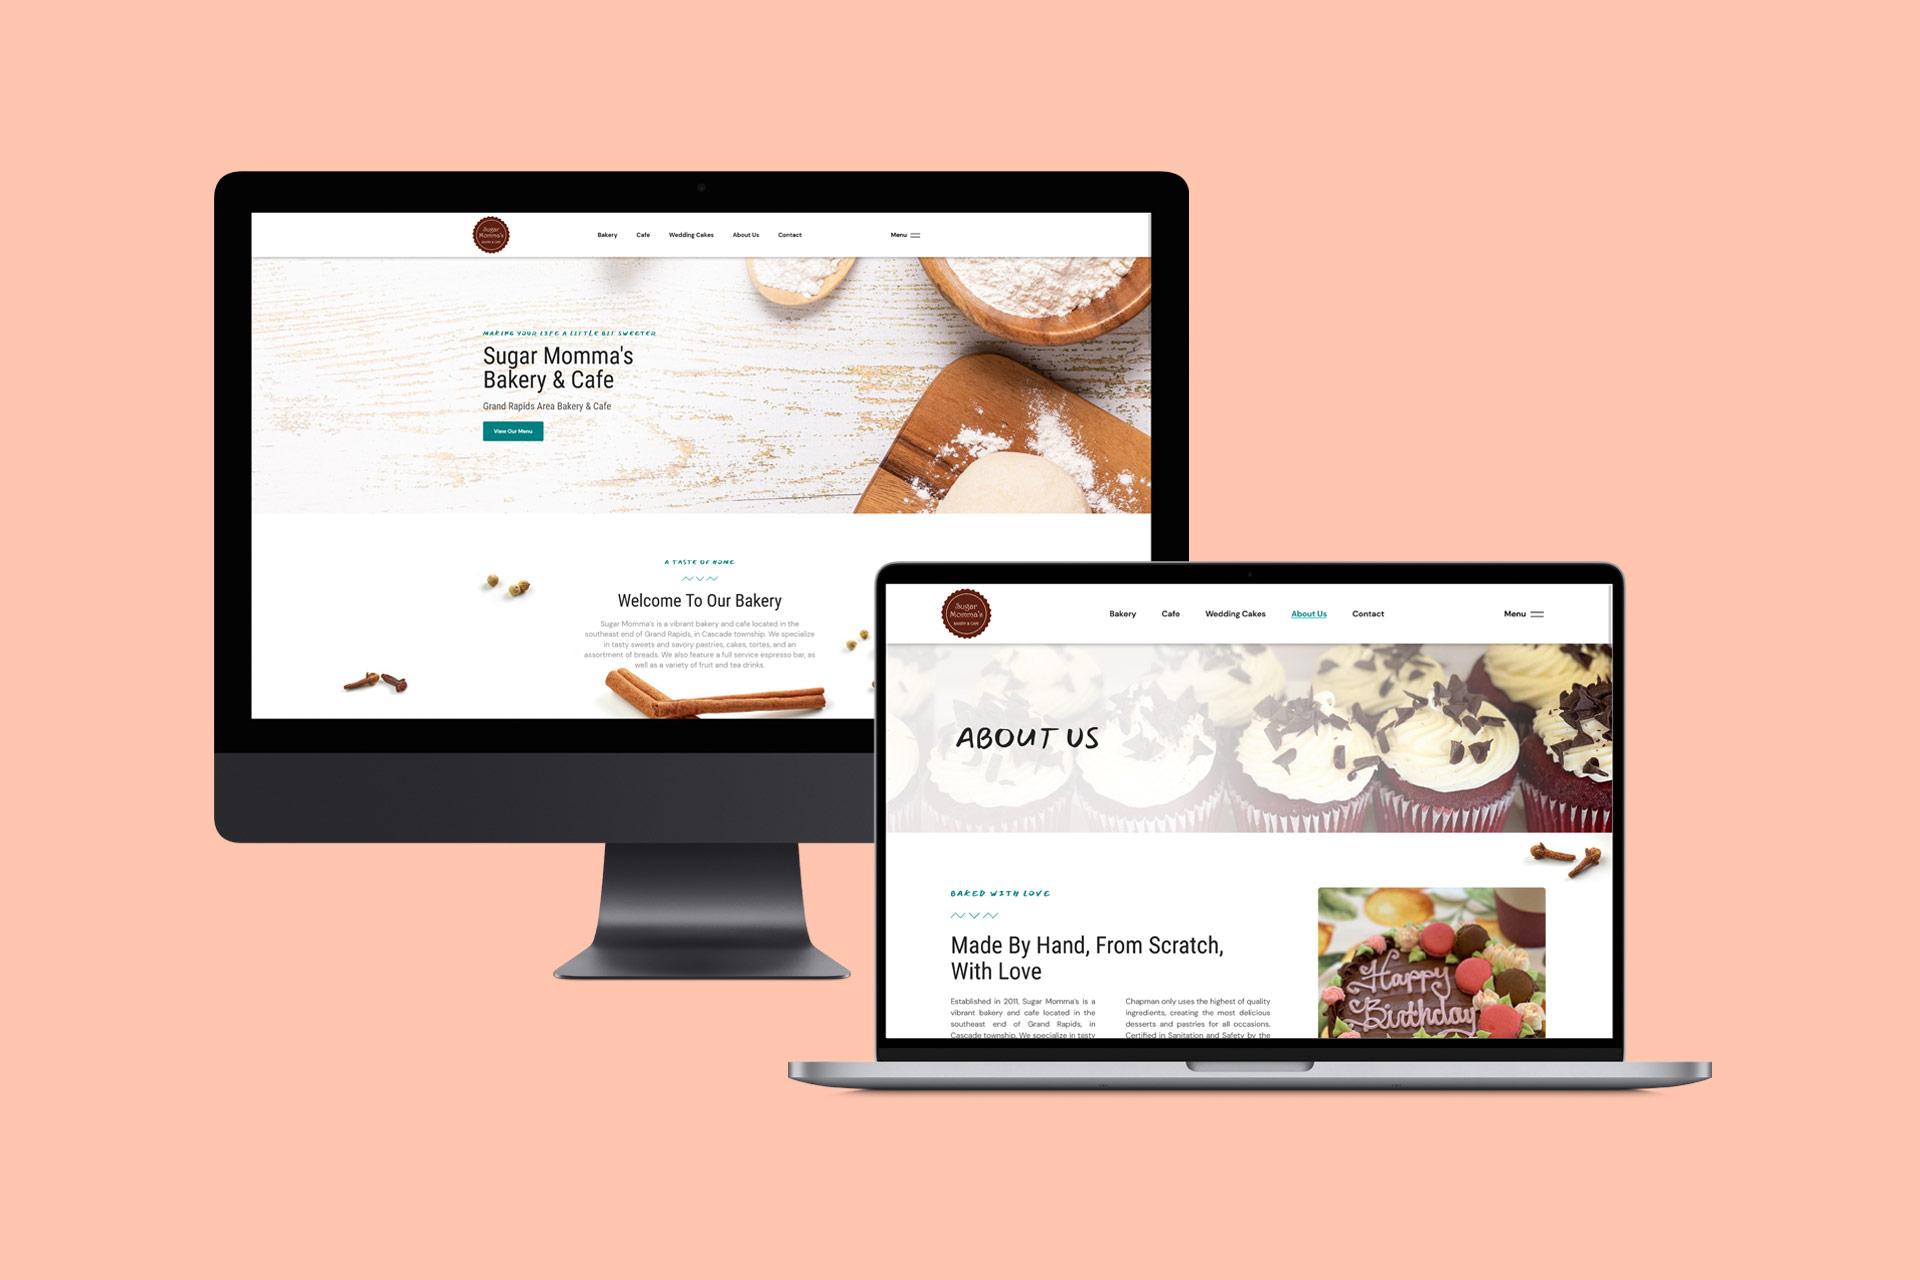 Bakery Cafe Website   WordPress Web Design and Development   E'finit Media San Antonio